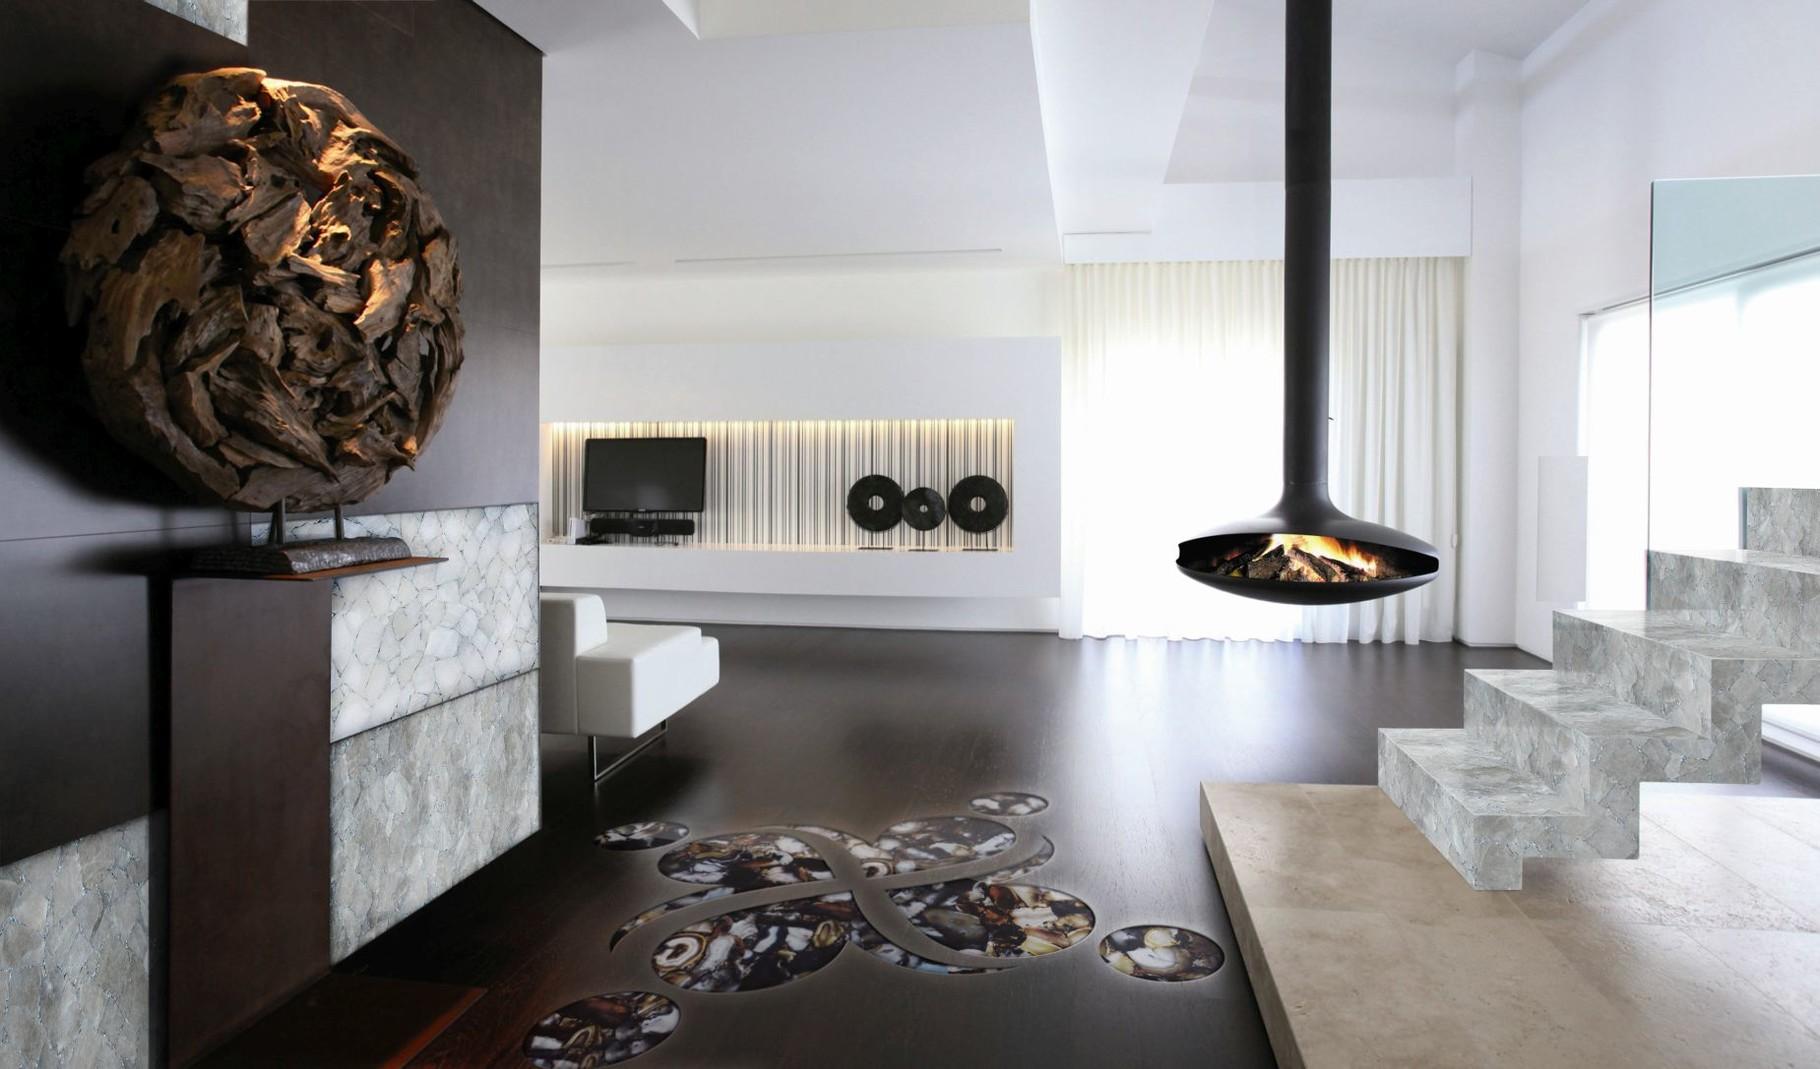 Luxyry elements of precious stone